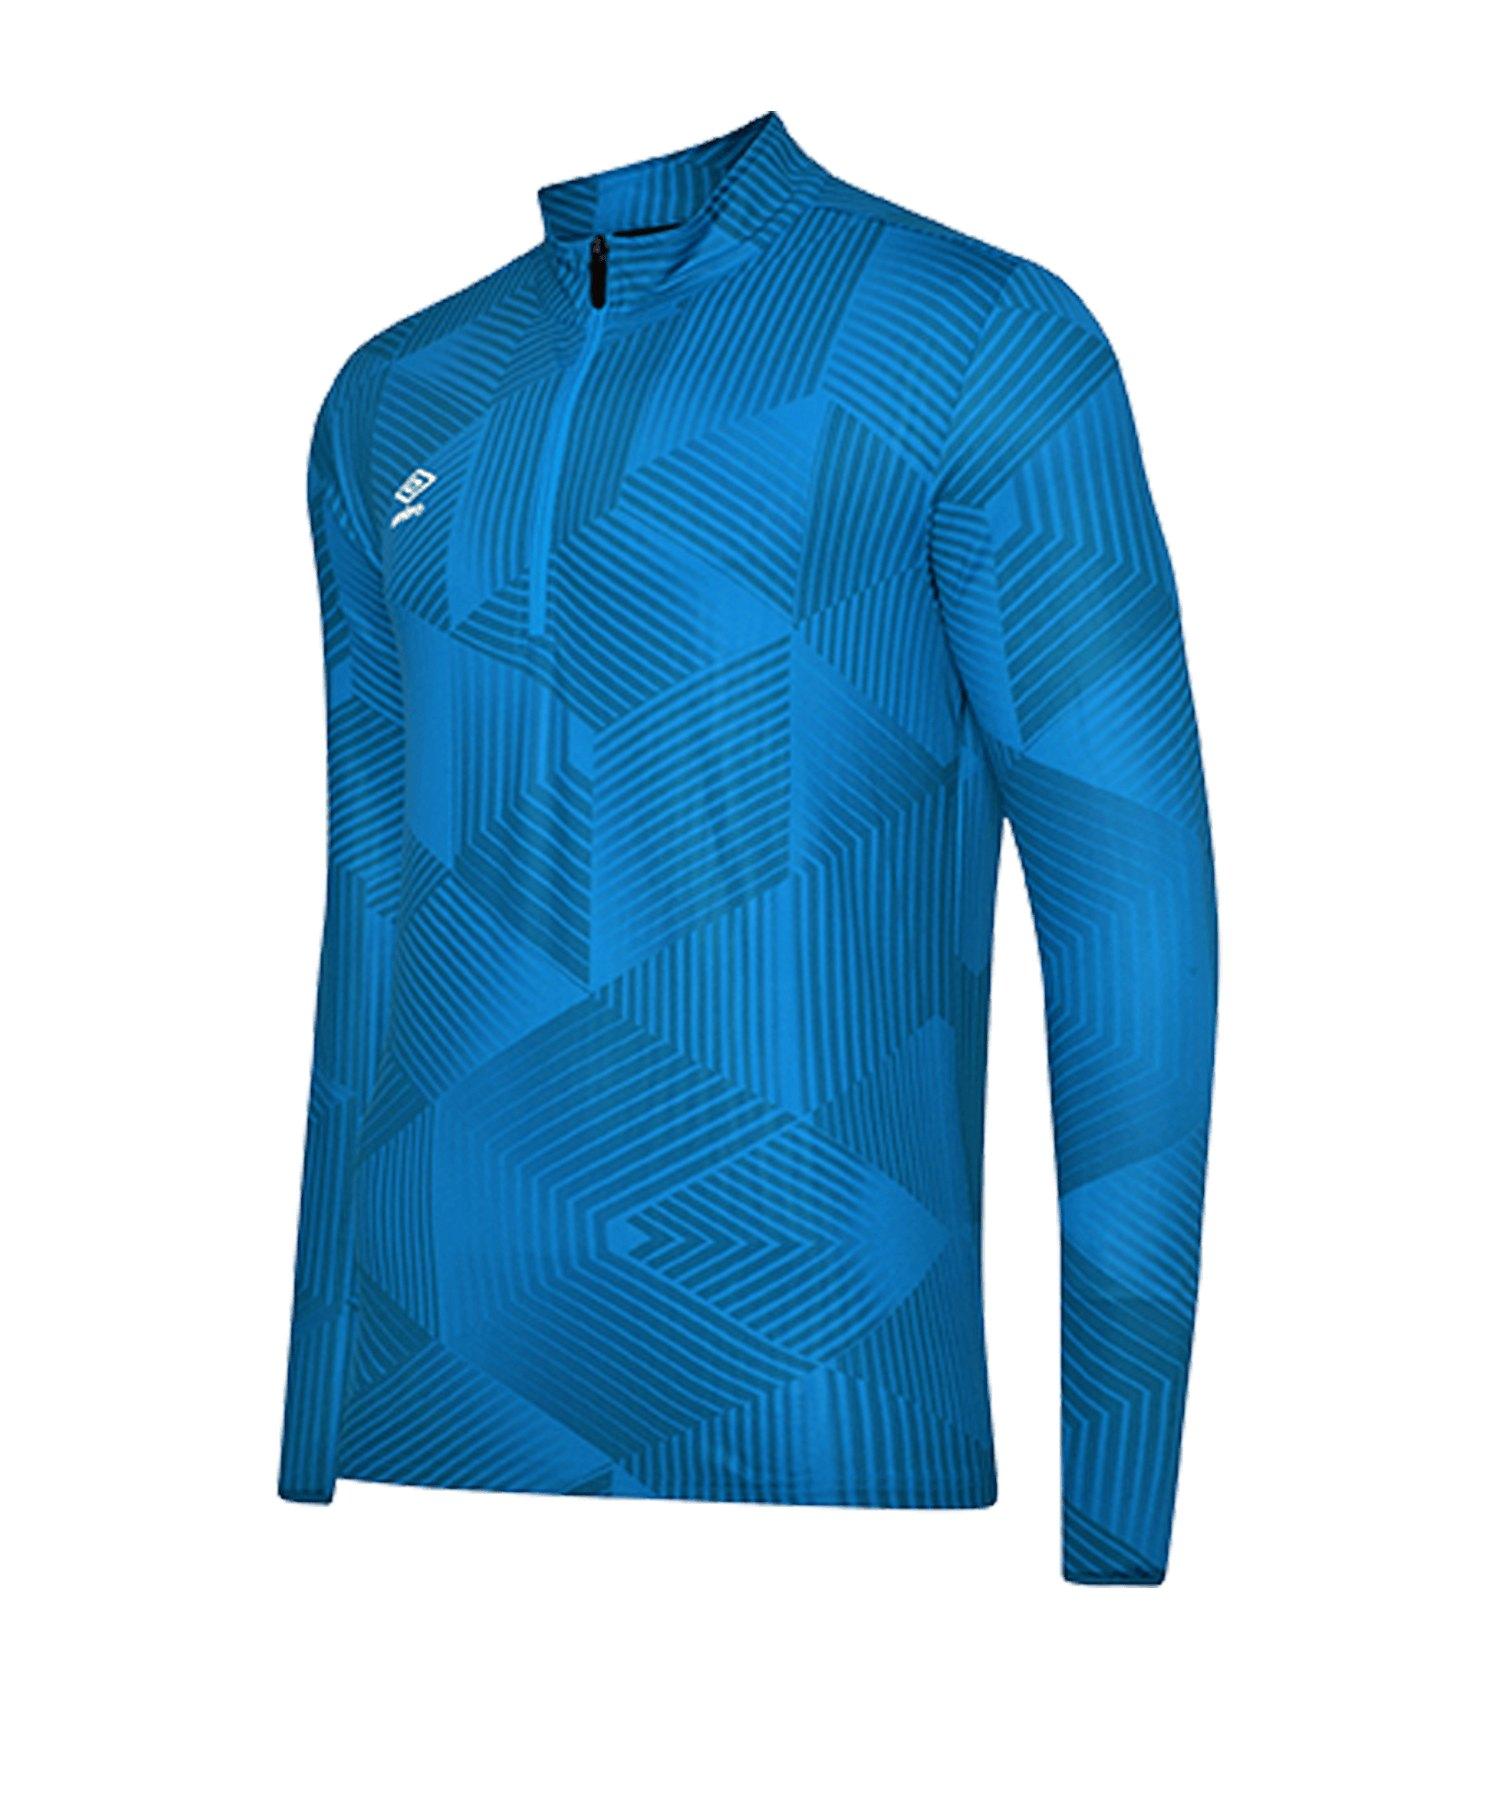 Umbro Maxium 1/4 Zip Training Sweatshirt F6AM - blau